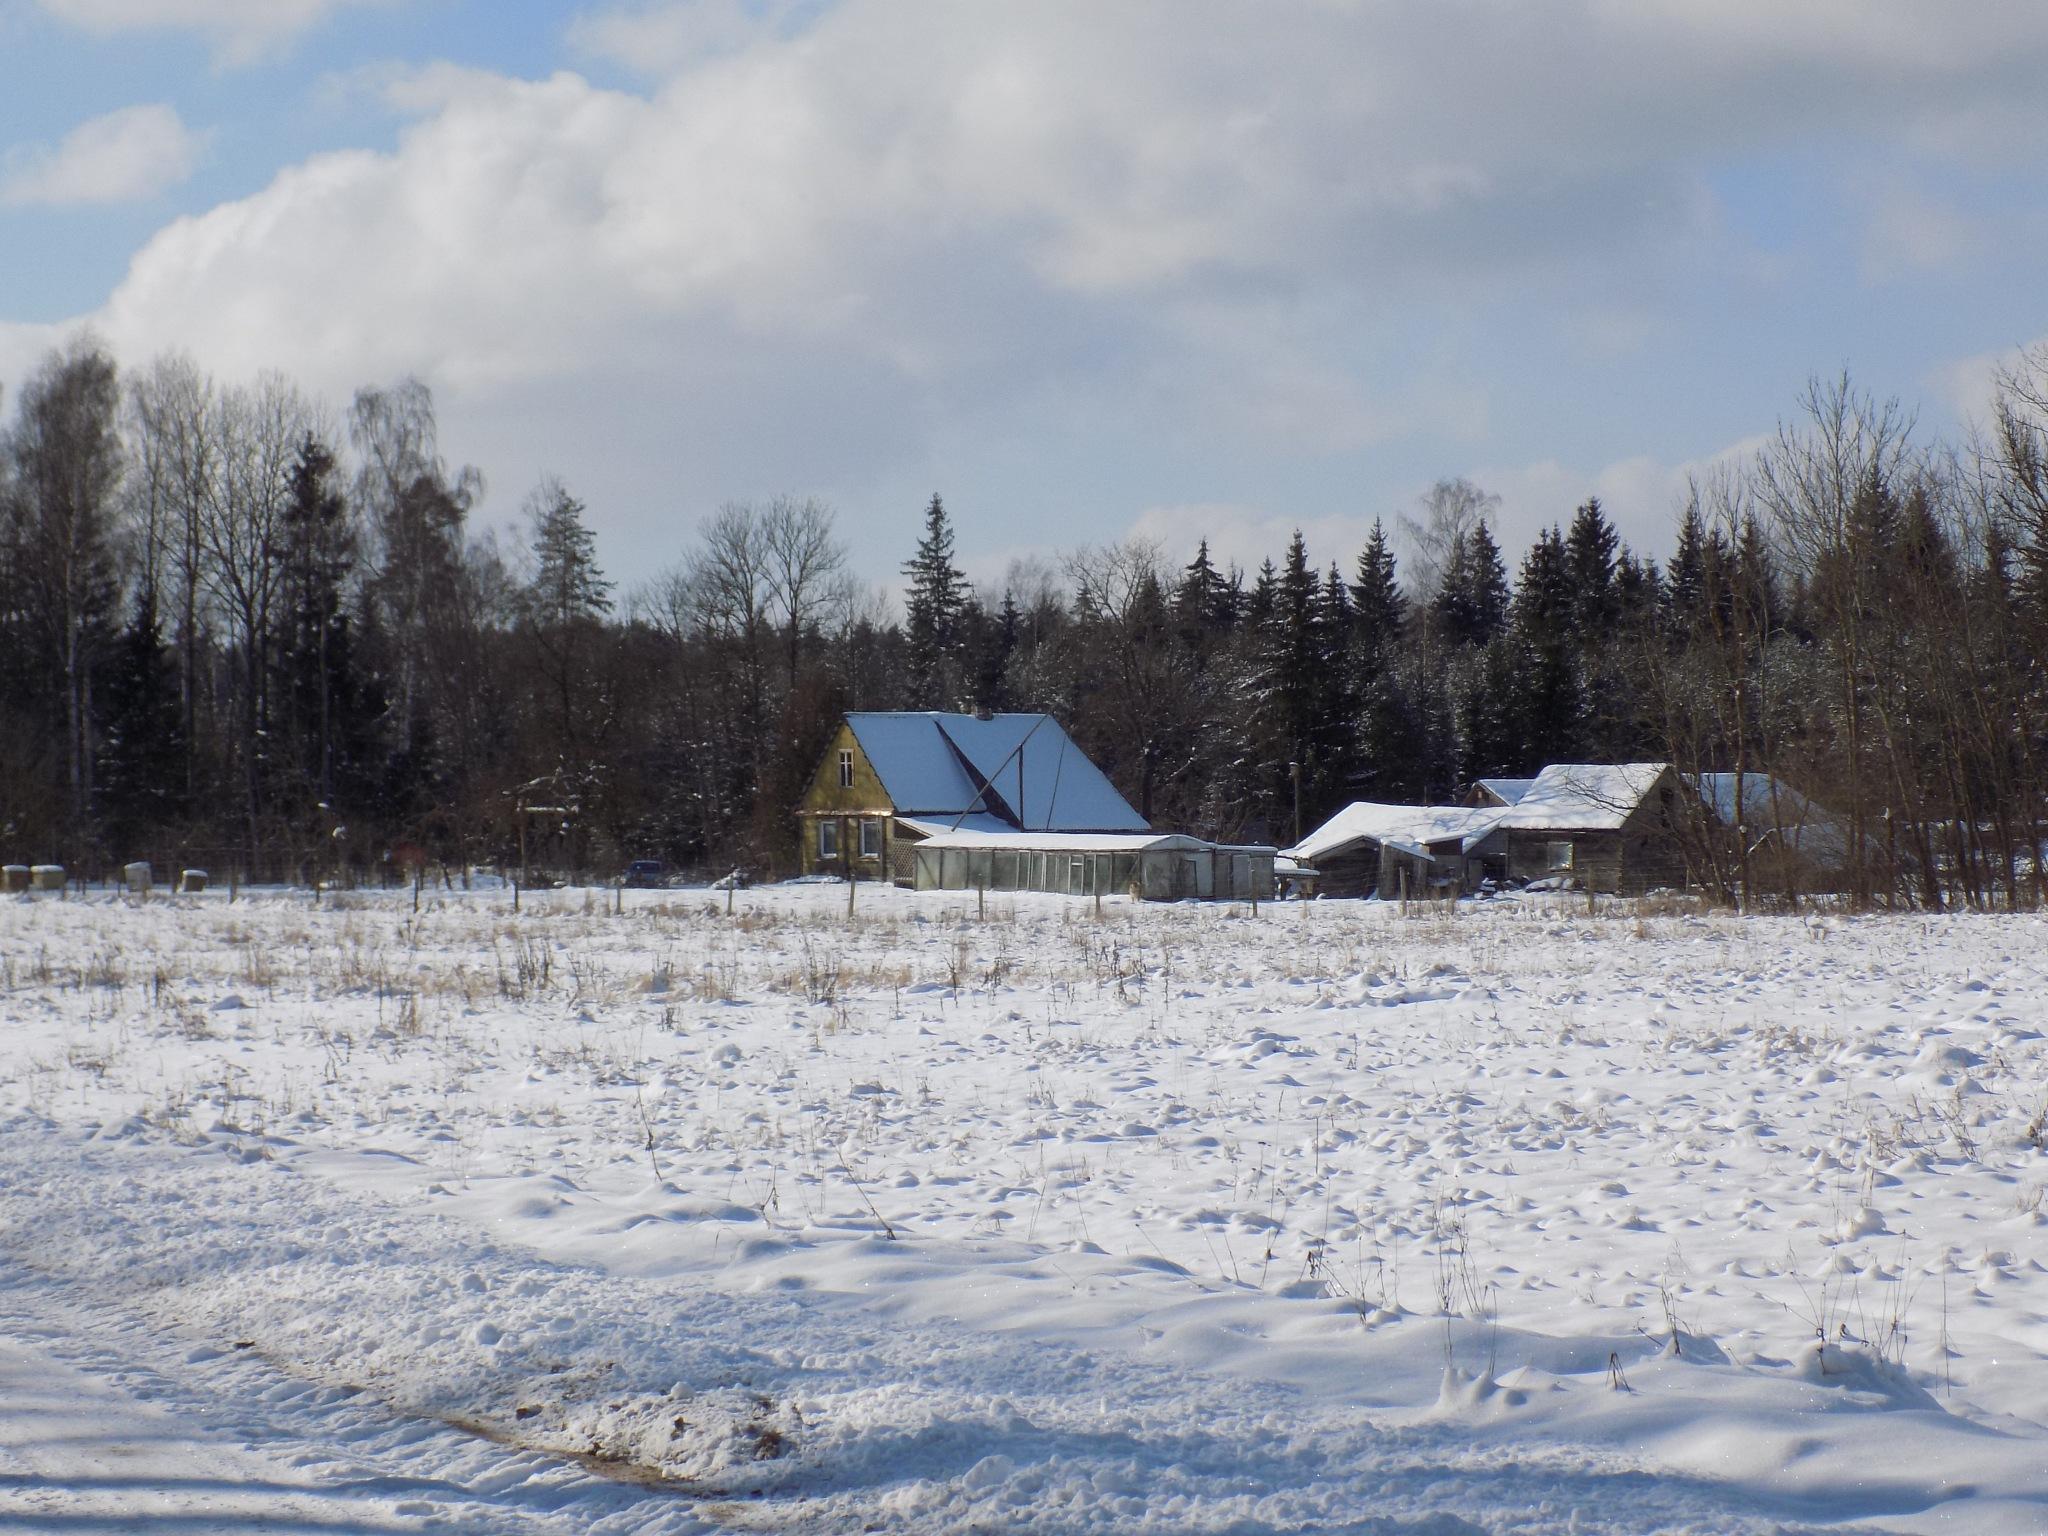 Landscape in the winter by uzkuraitiene62